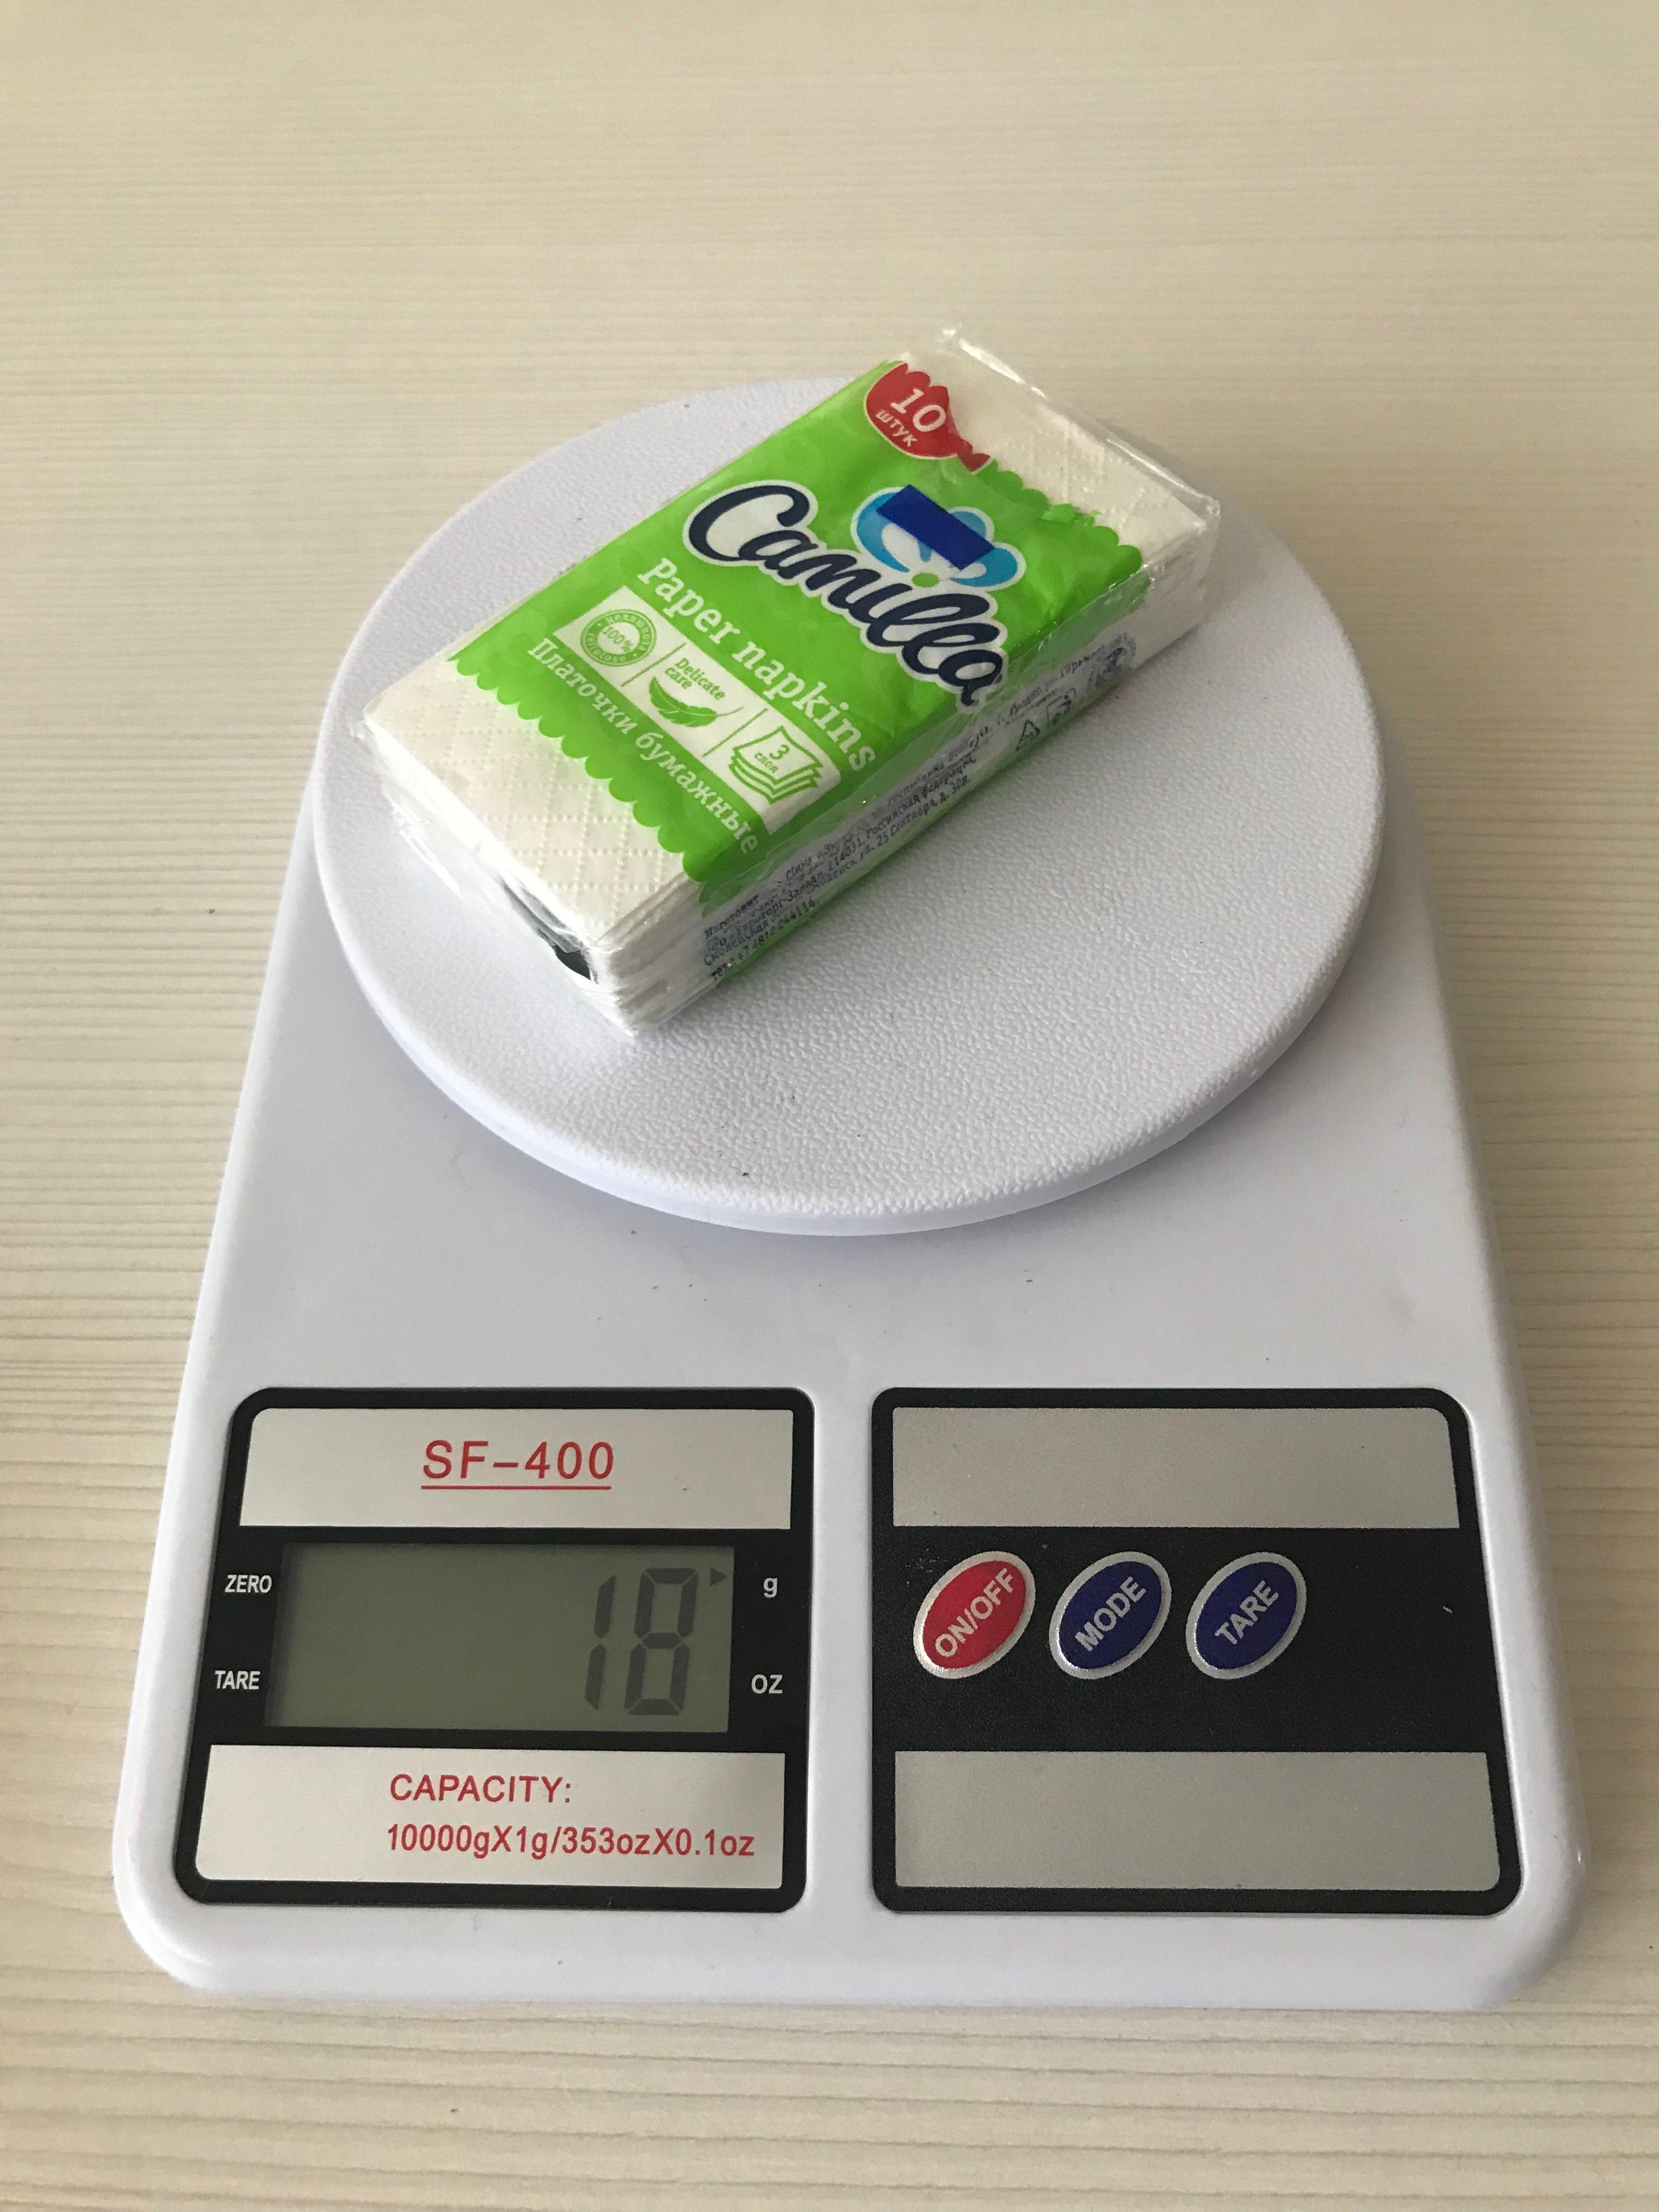 вес упаковки салфеток